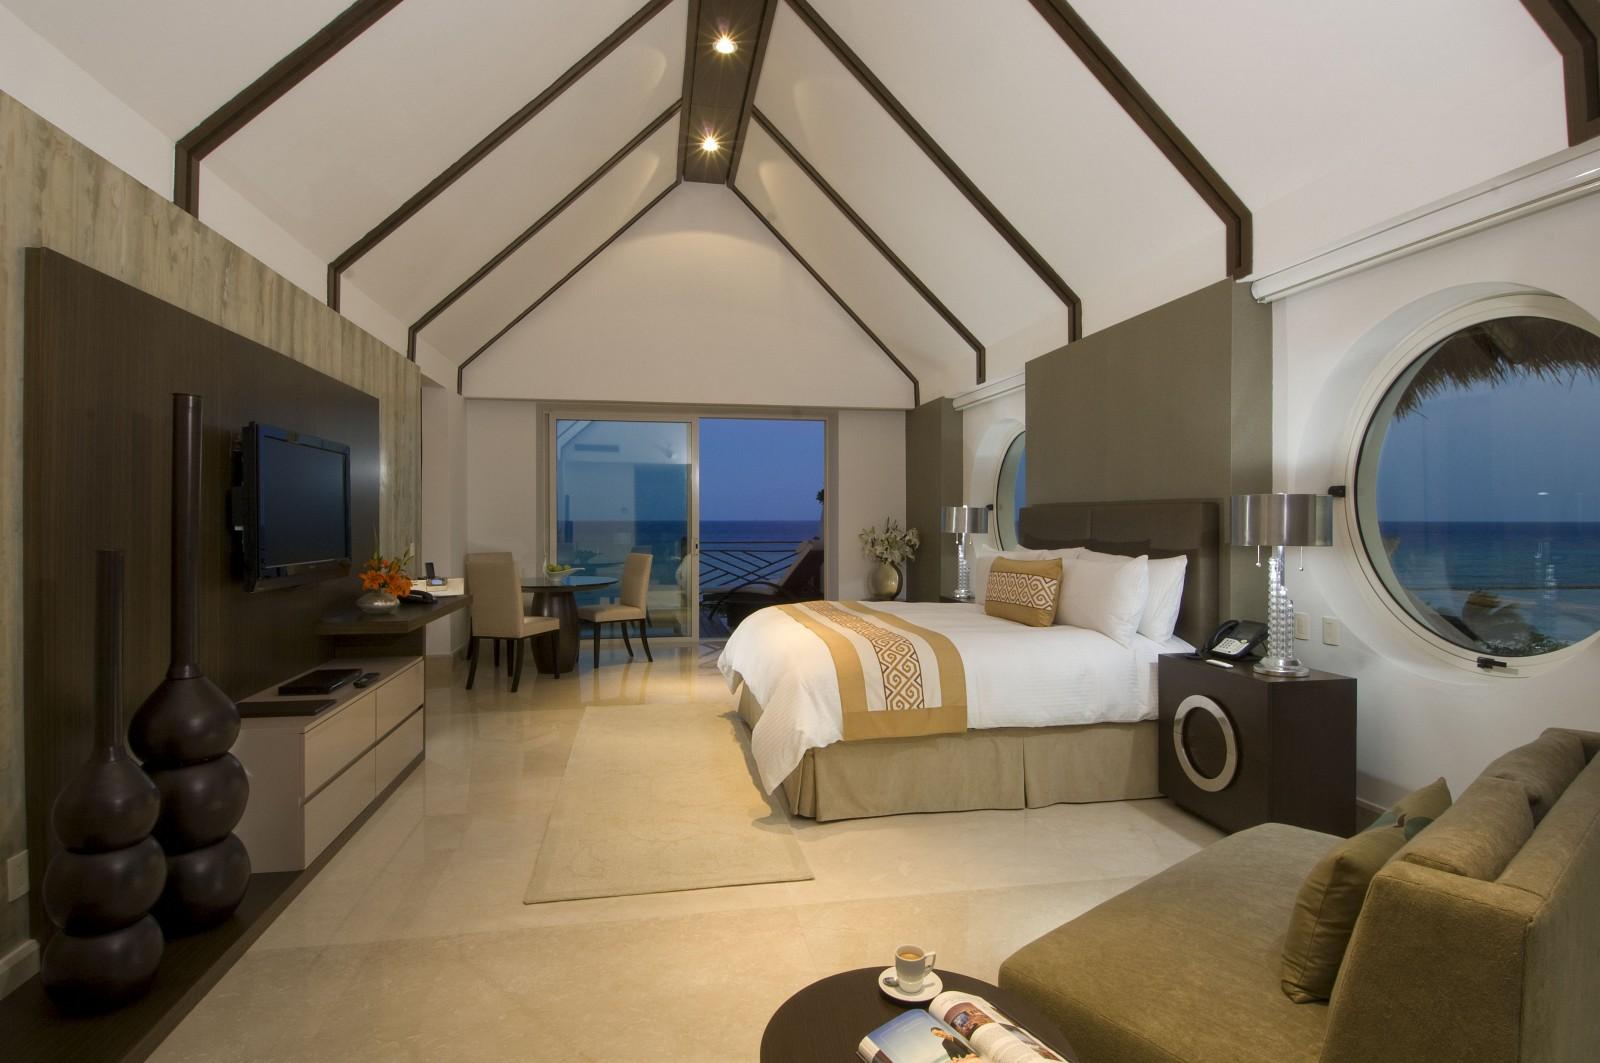 Travel Agency All-Inclusive Resort Grand Velas Riviera Maya 029